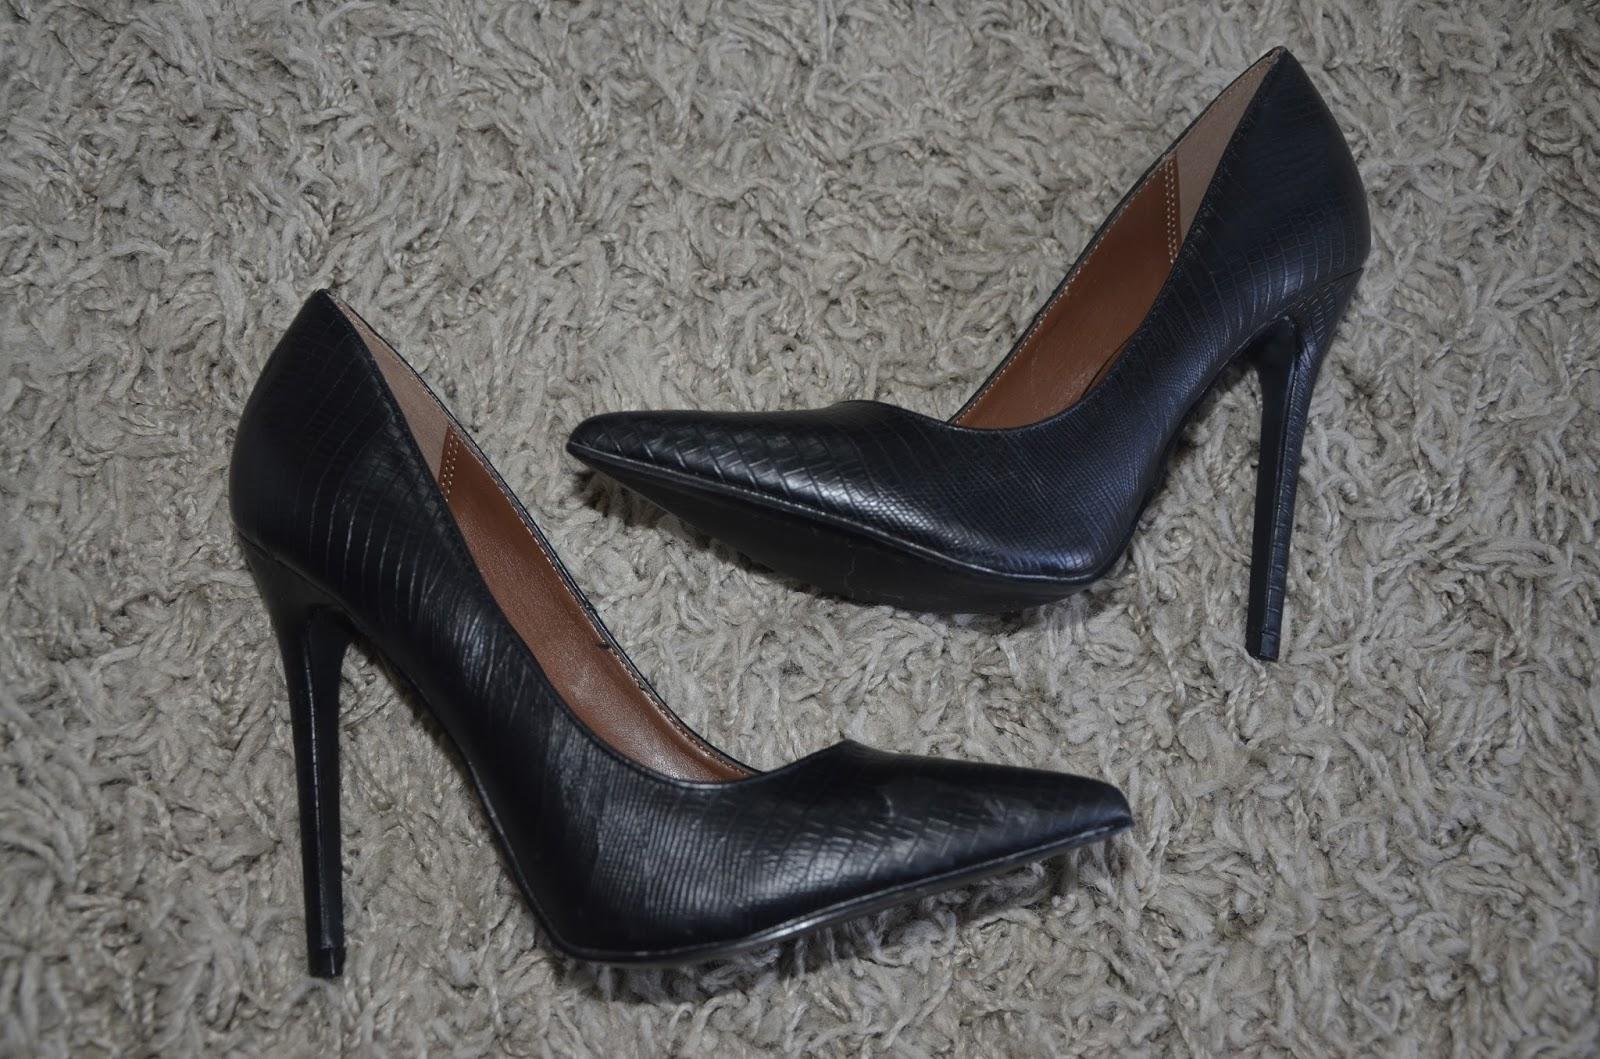 Sapatos lindos recebidos da Amiclubwear